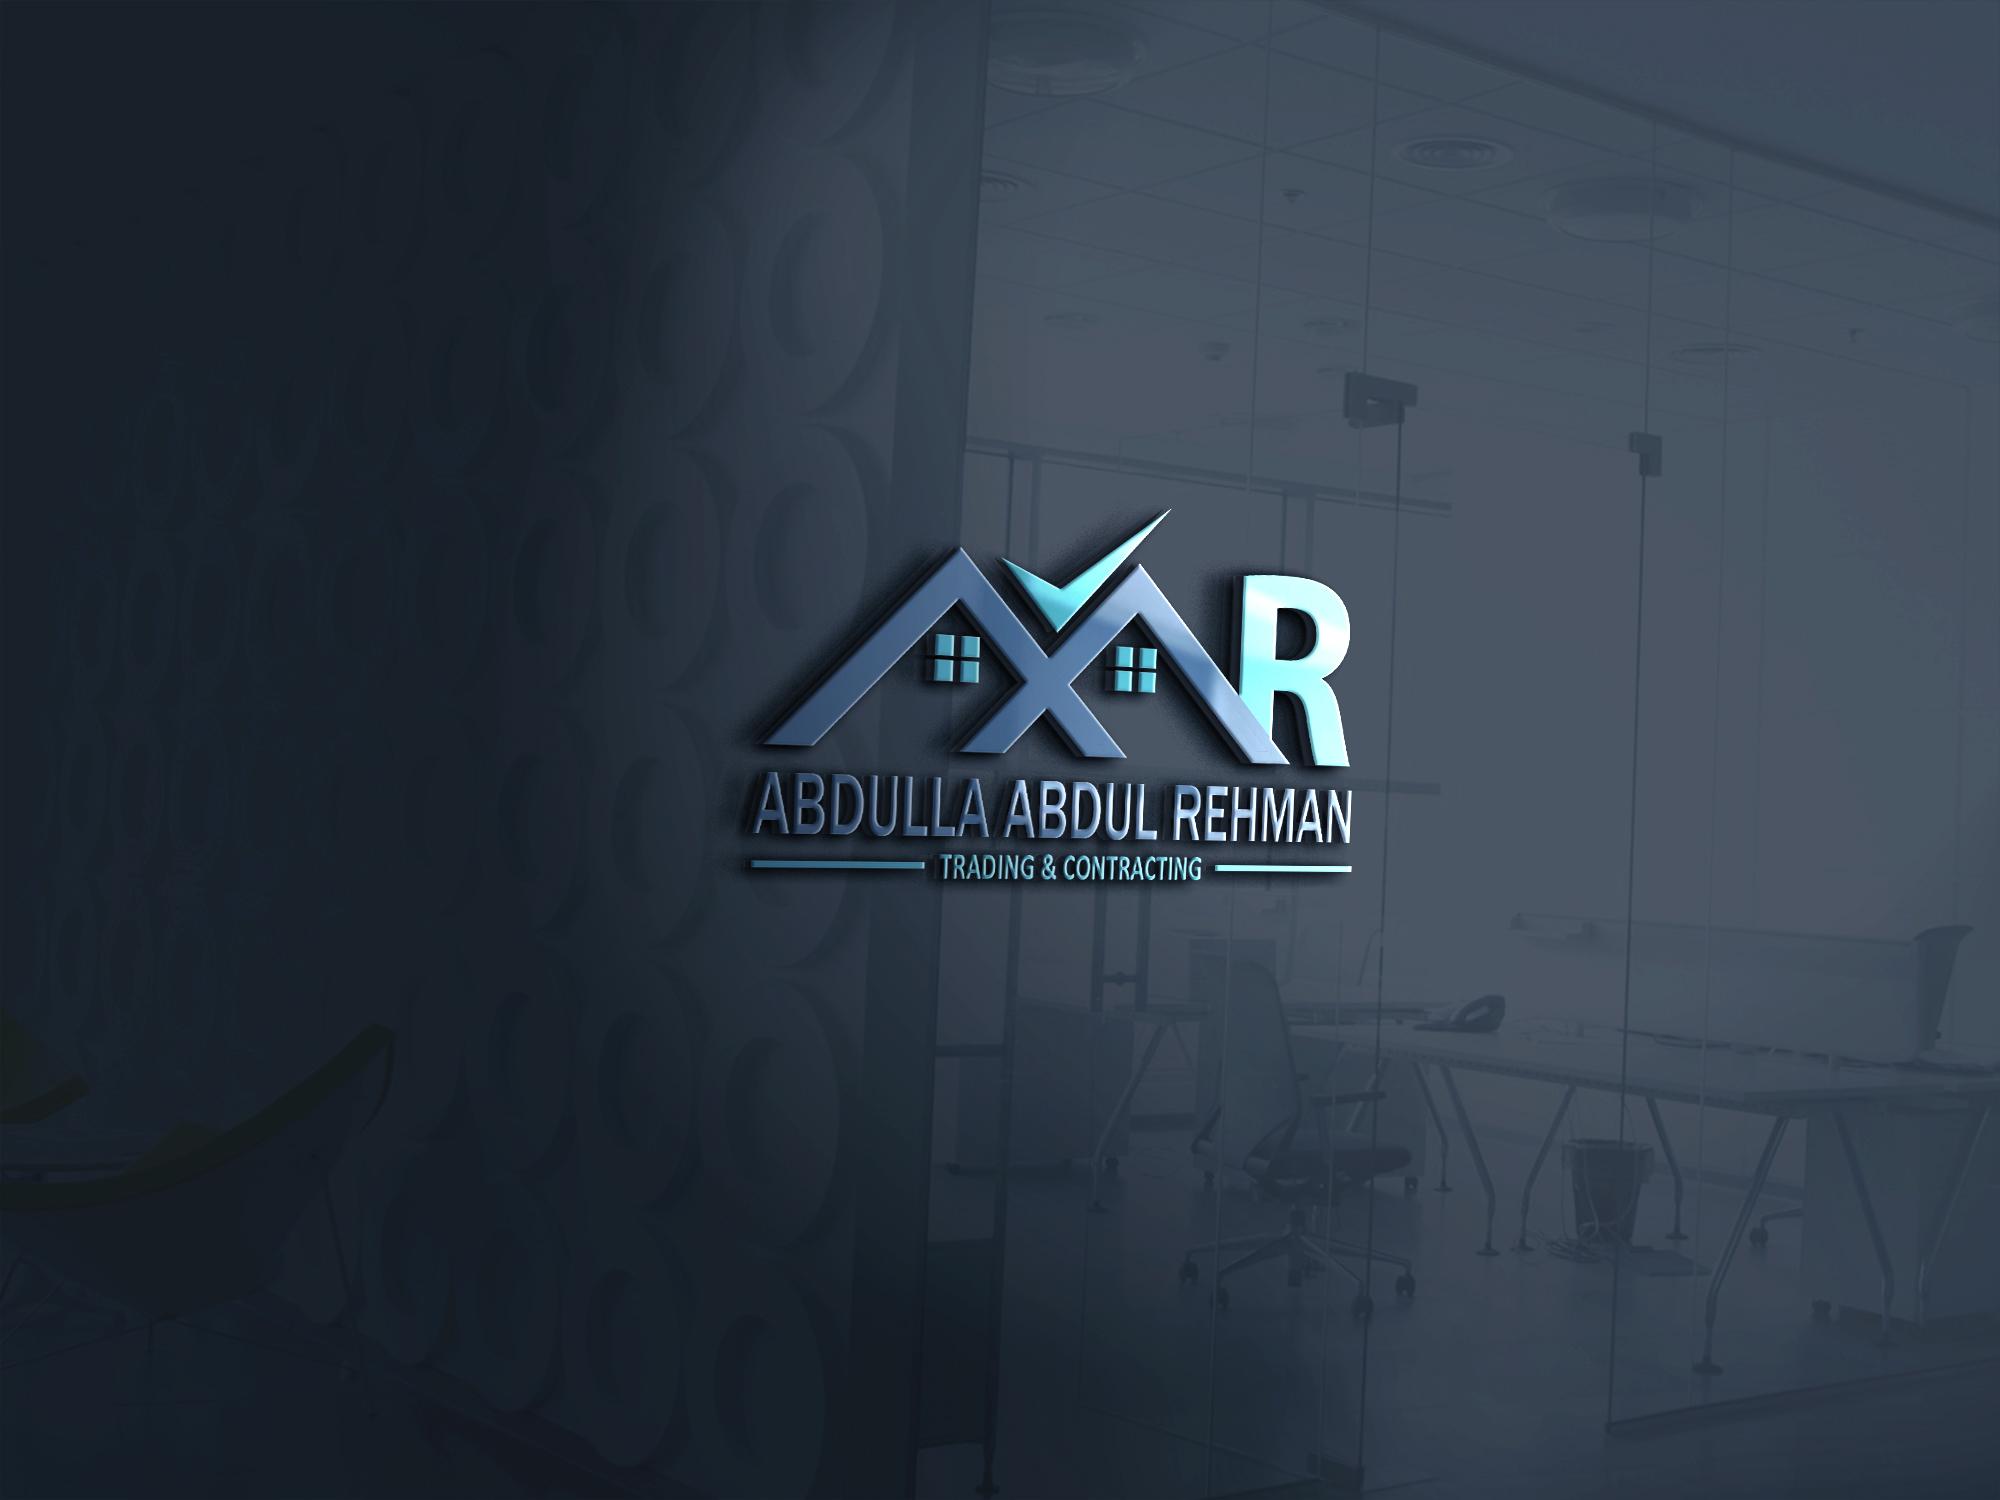 I will create a professional business logo design